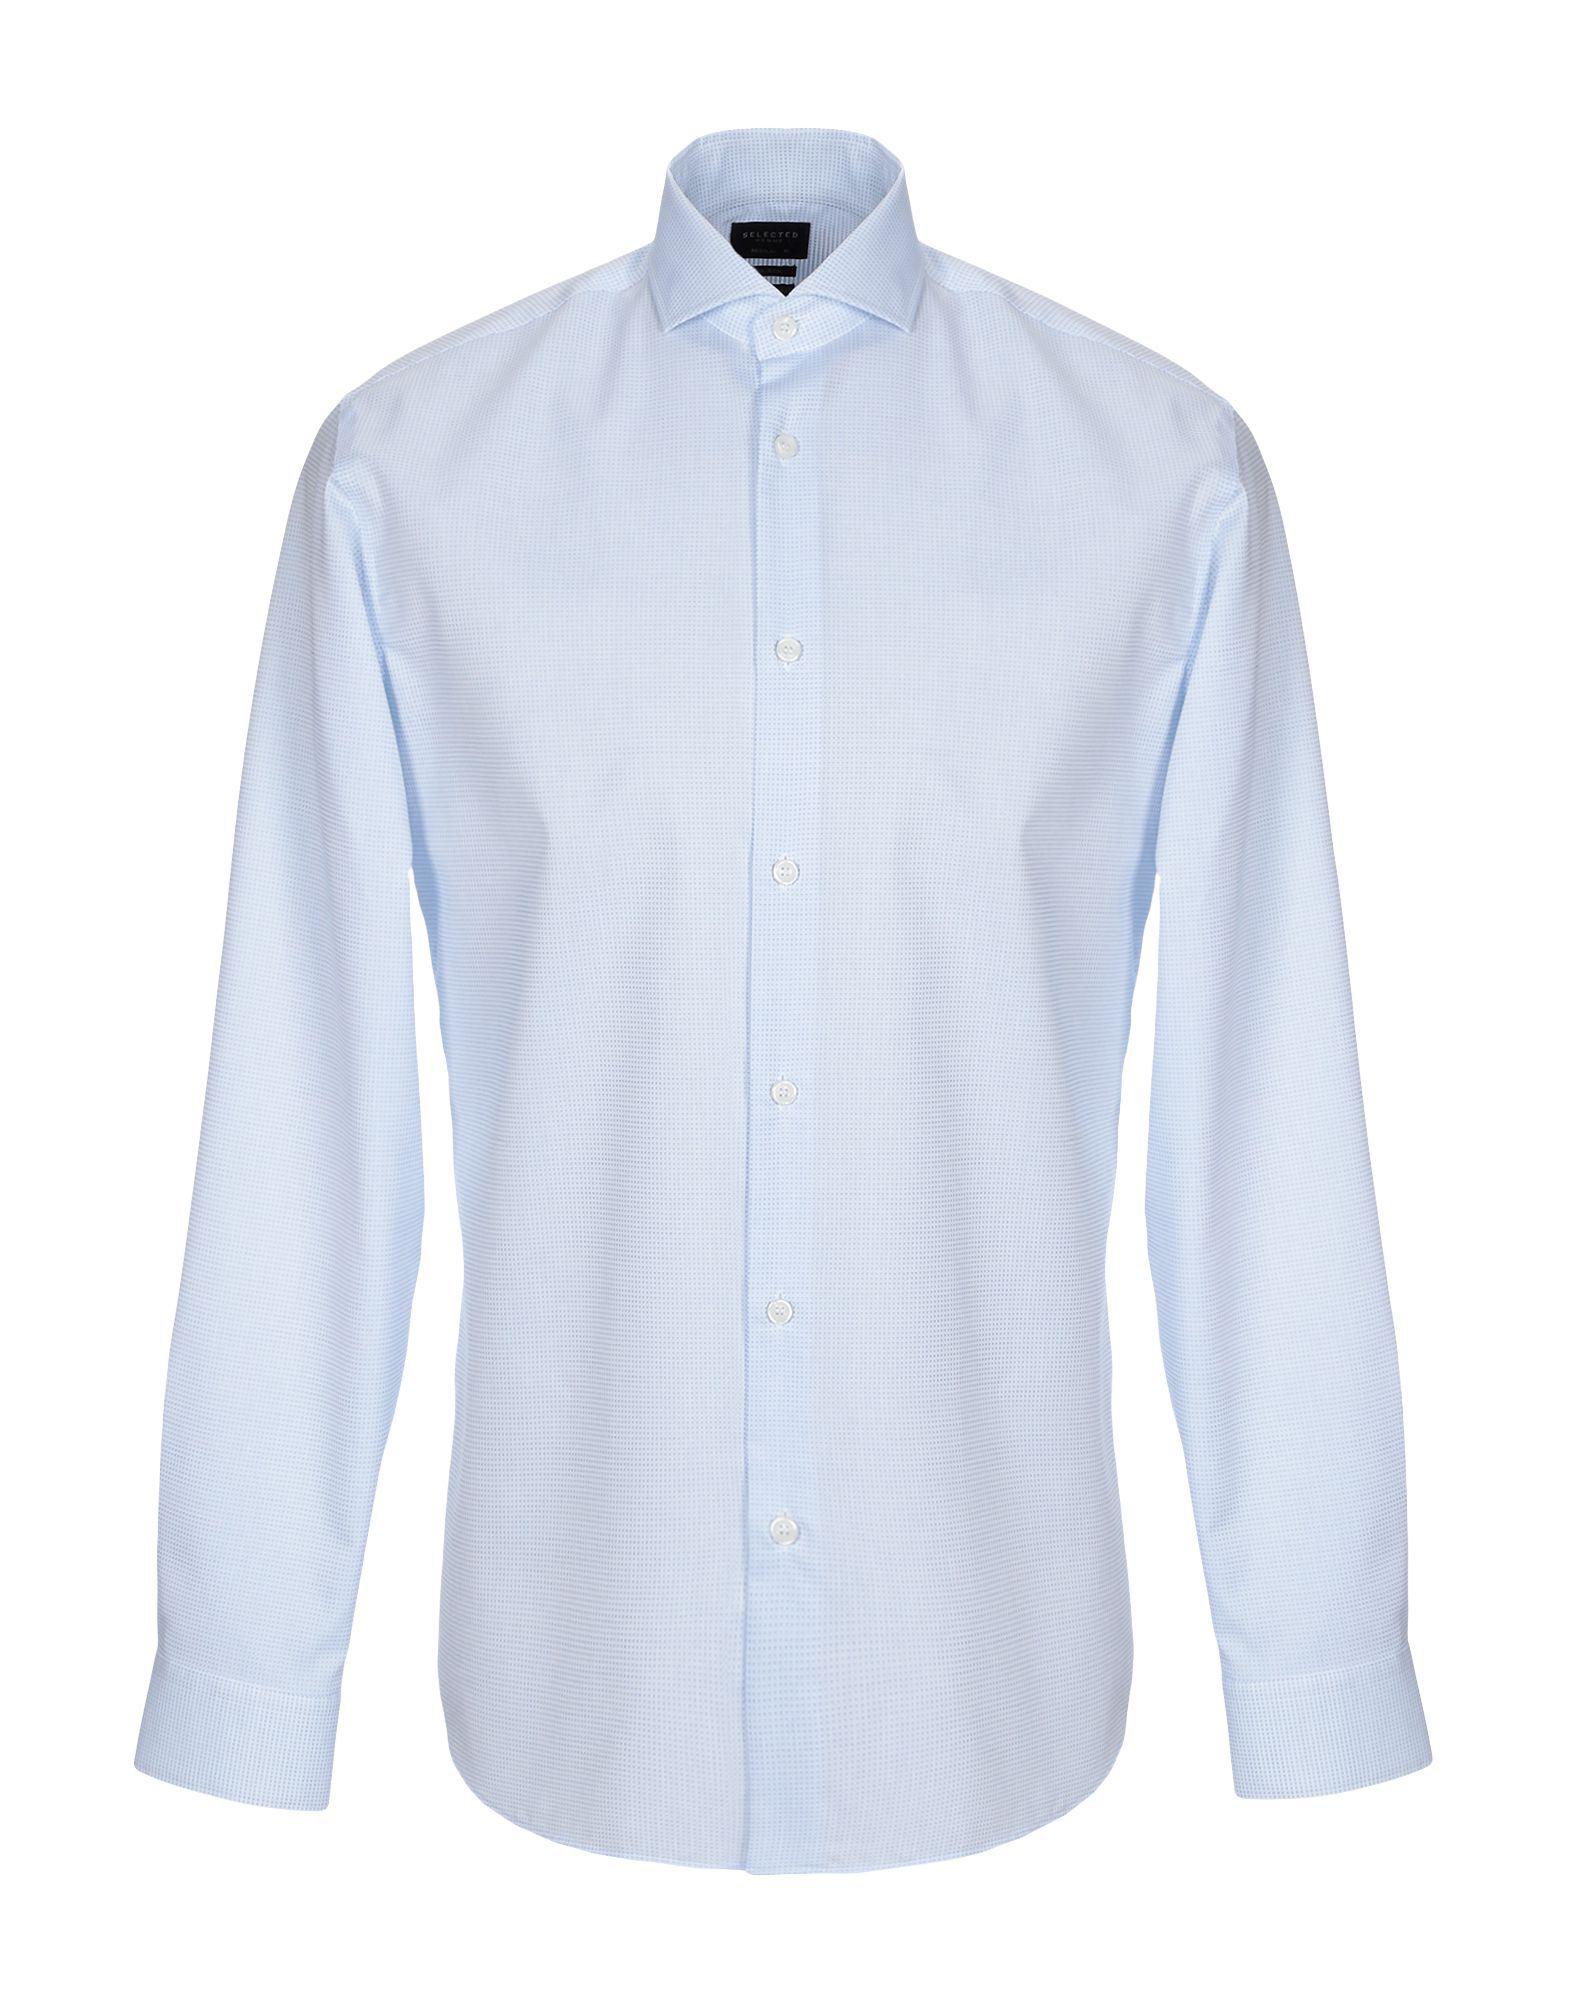 Selected Homme Azure Cotton Shirt